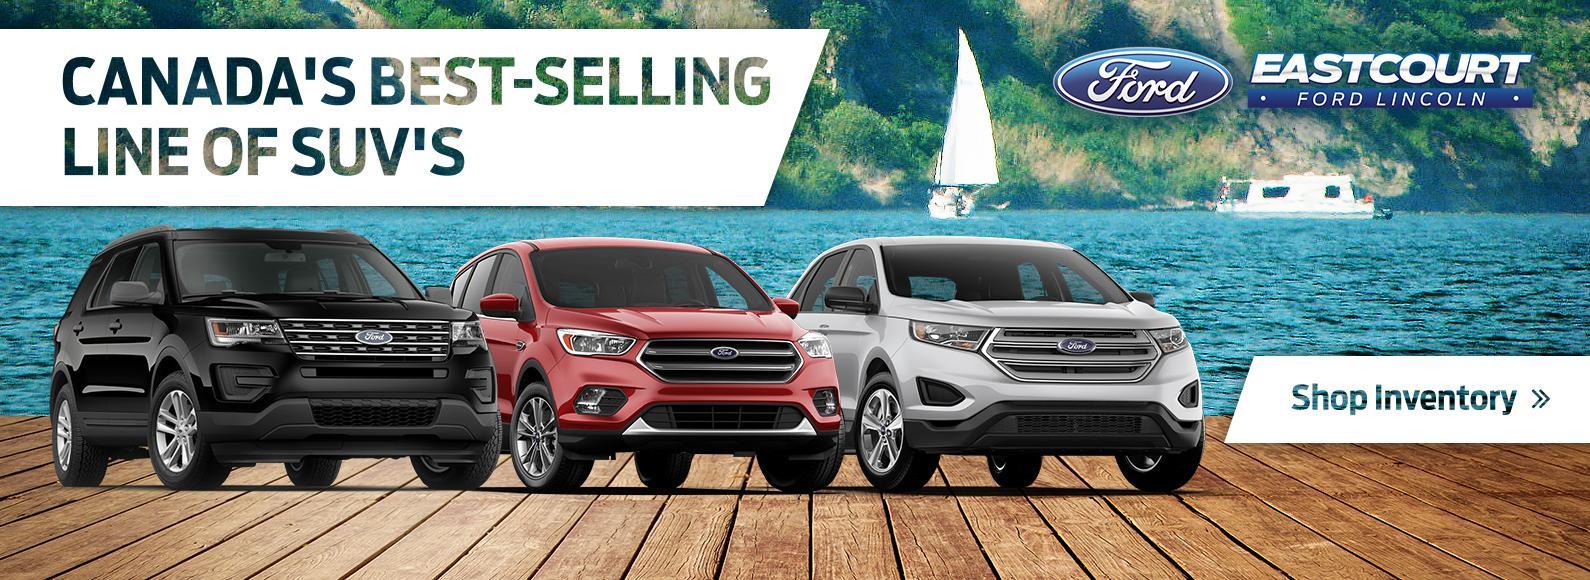 Toronto Ford Dealership